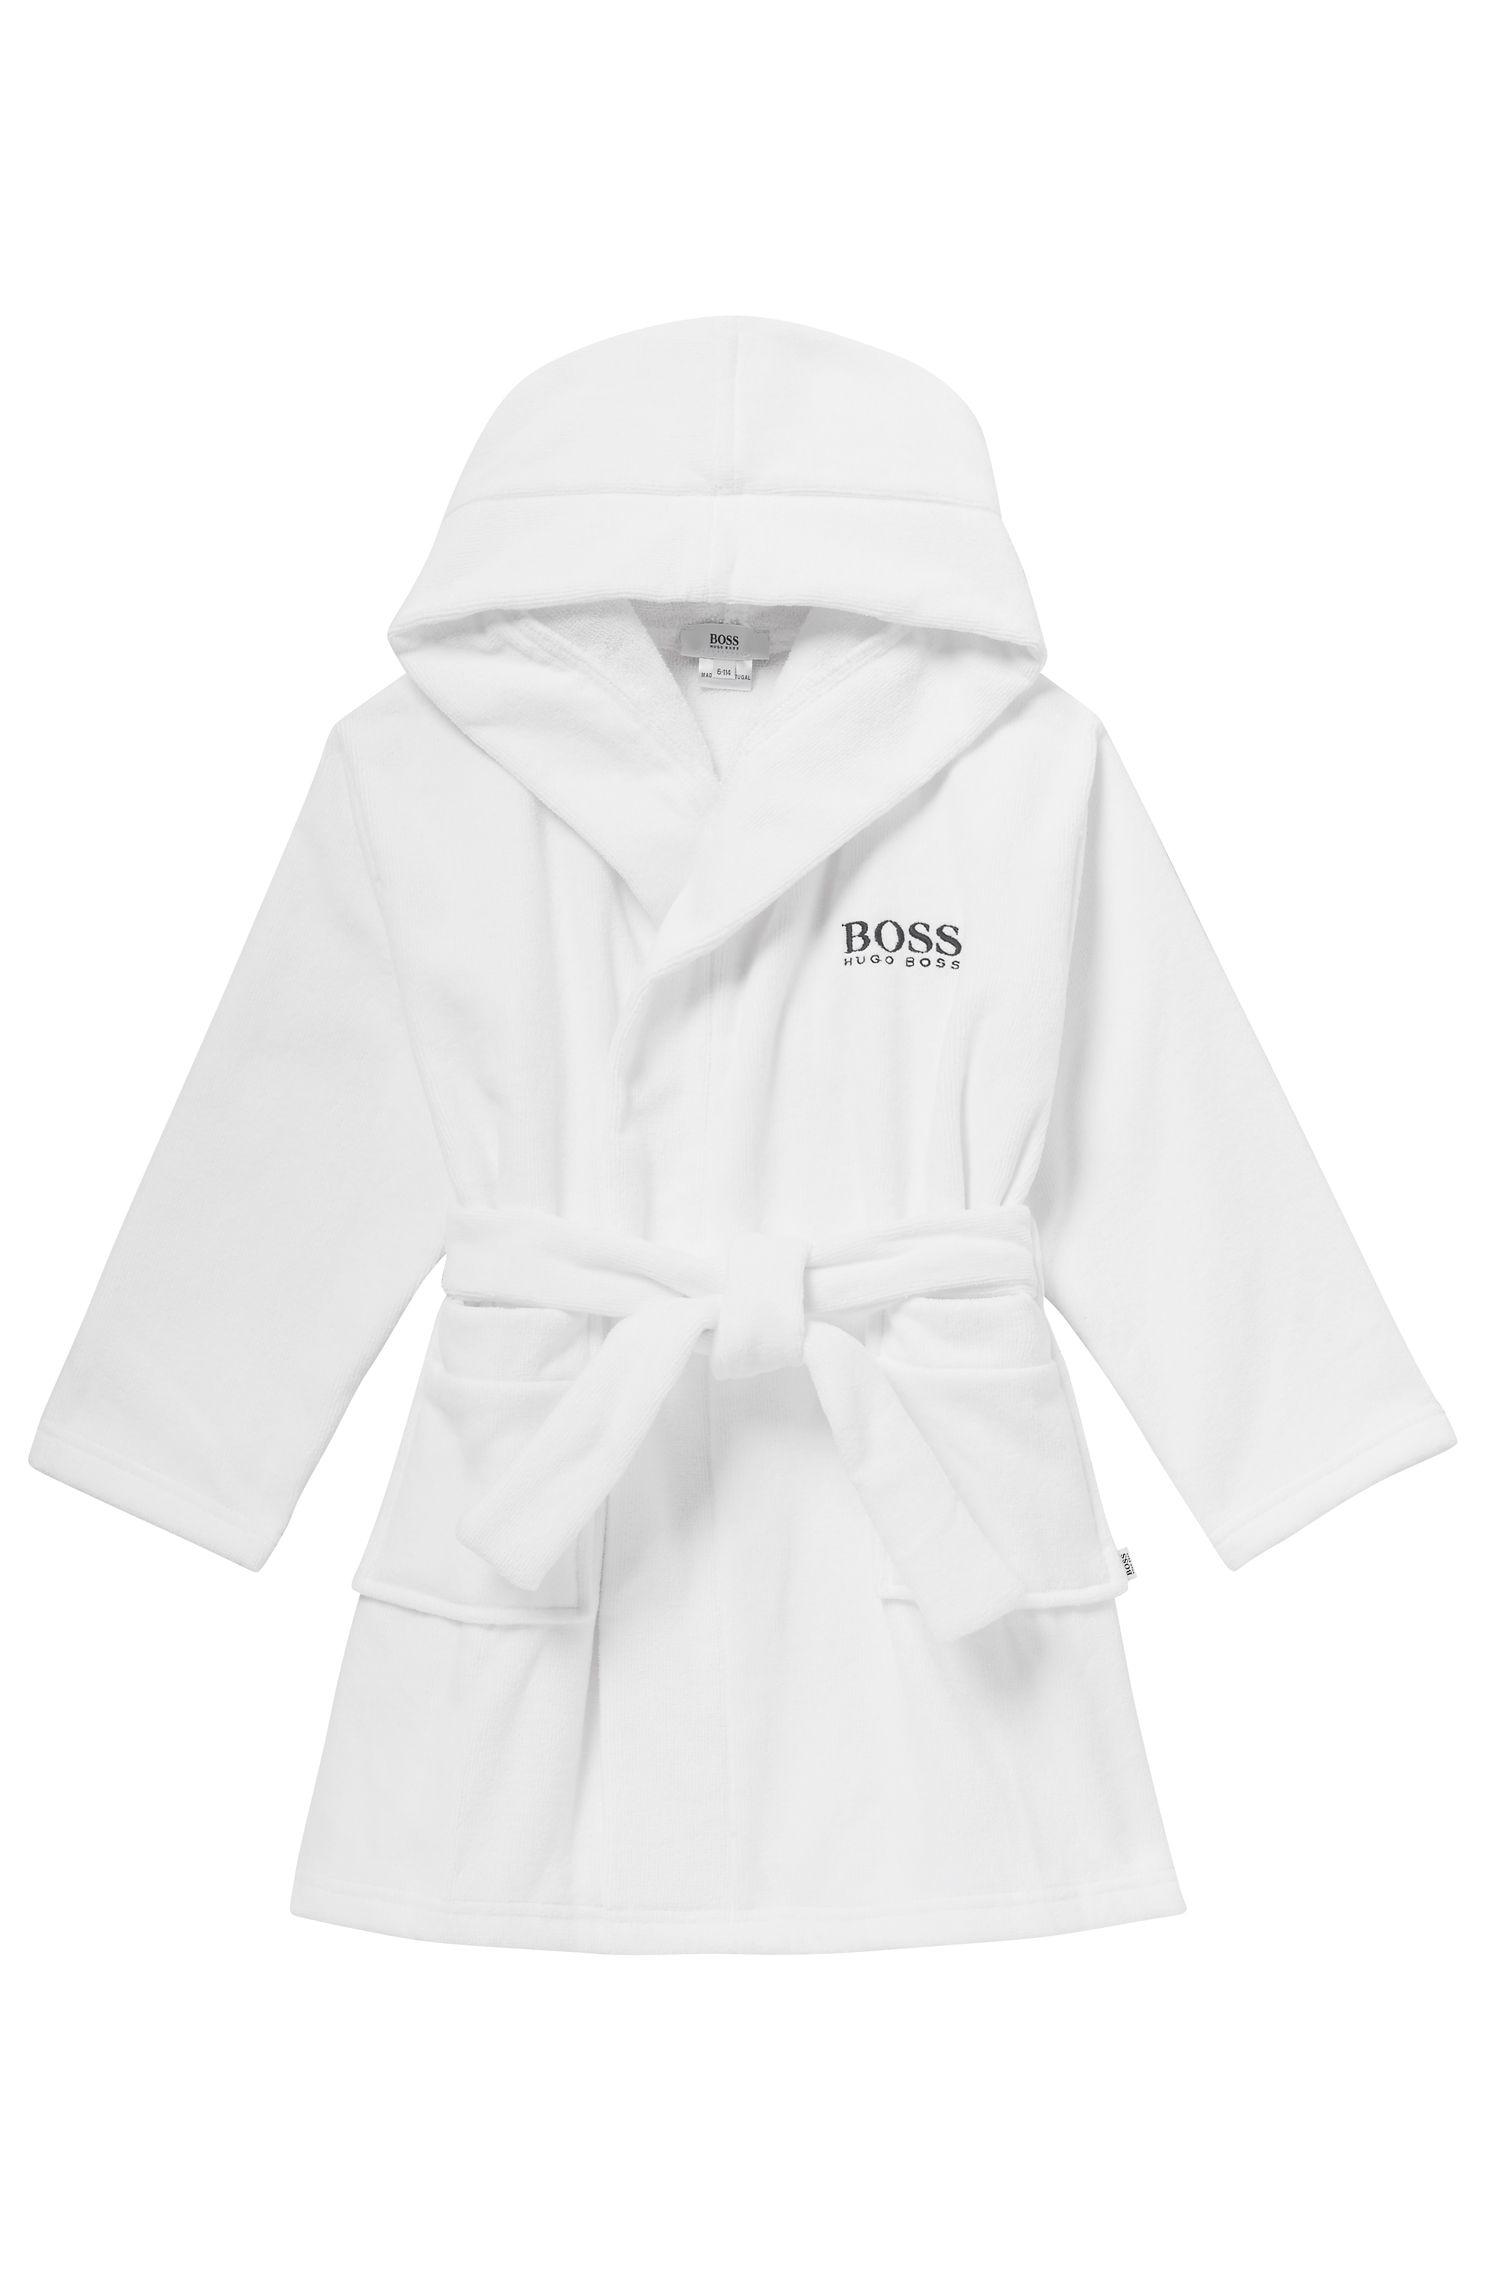 'J27V60' | Boys Cotton Terry Hooded Bath Robe